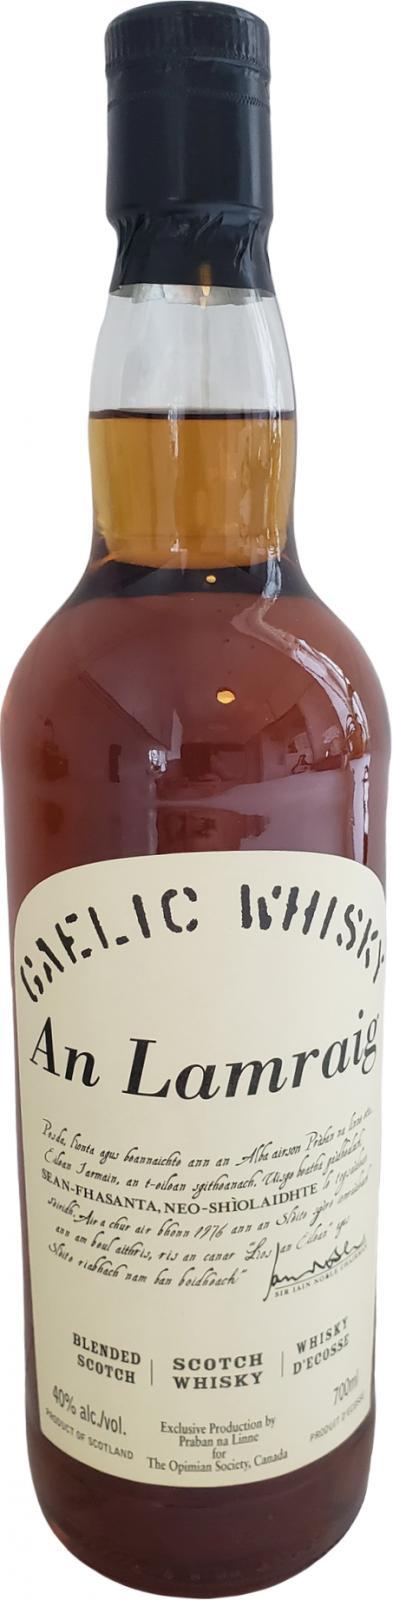 Blended Scotch Whisky An Lamraig